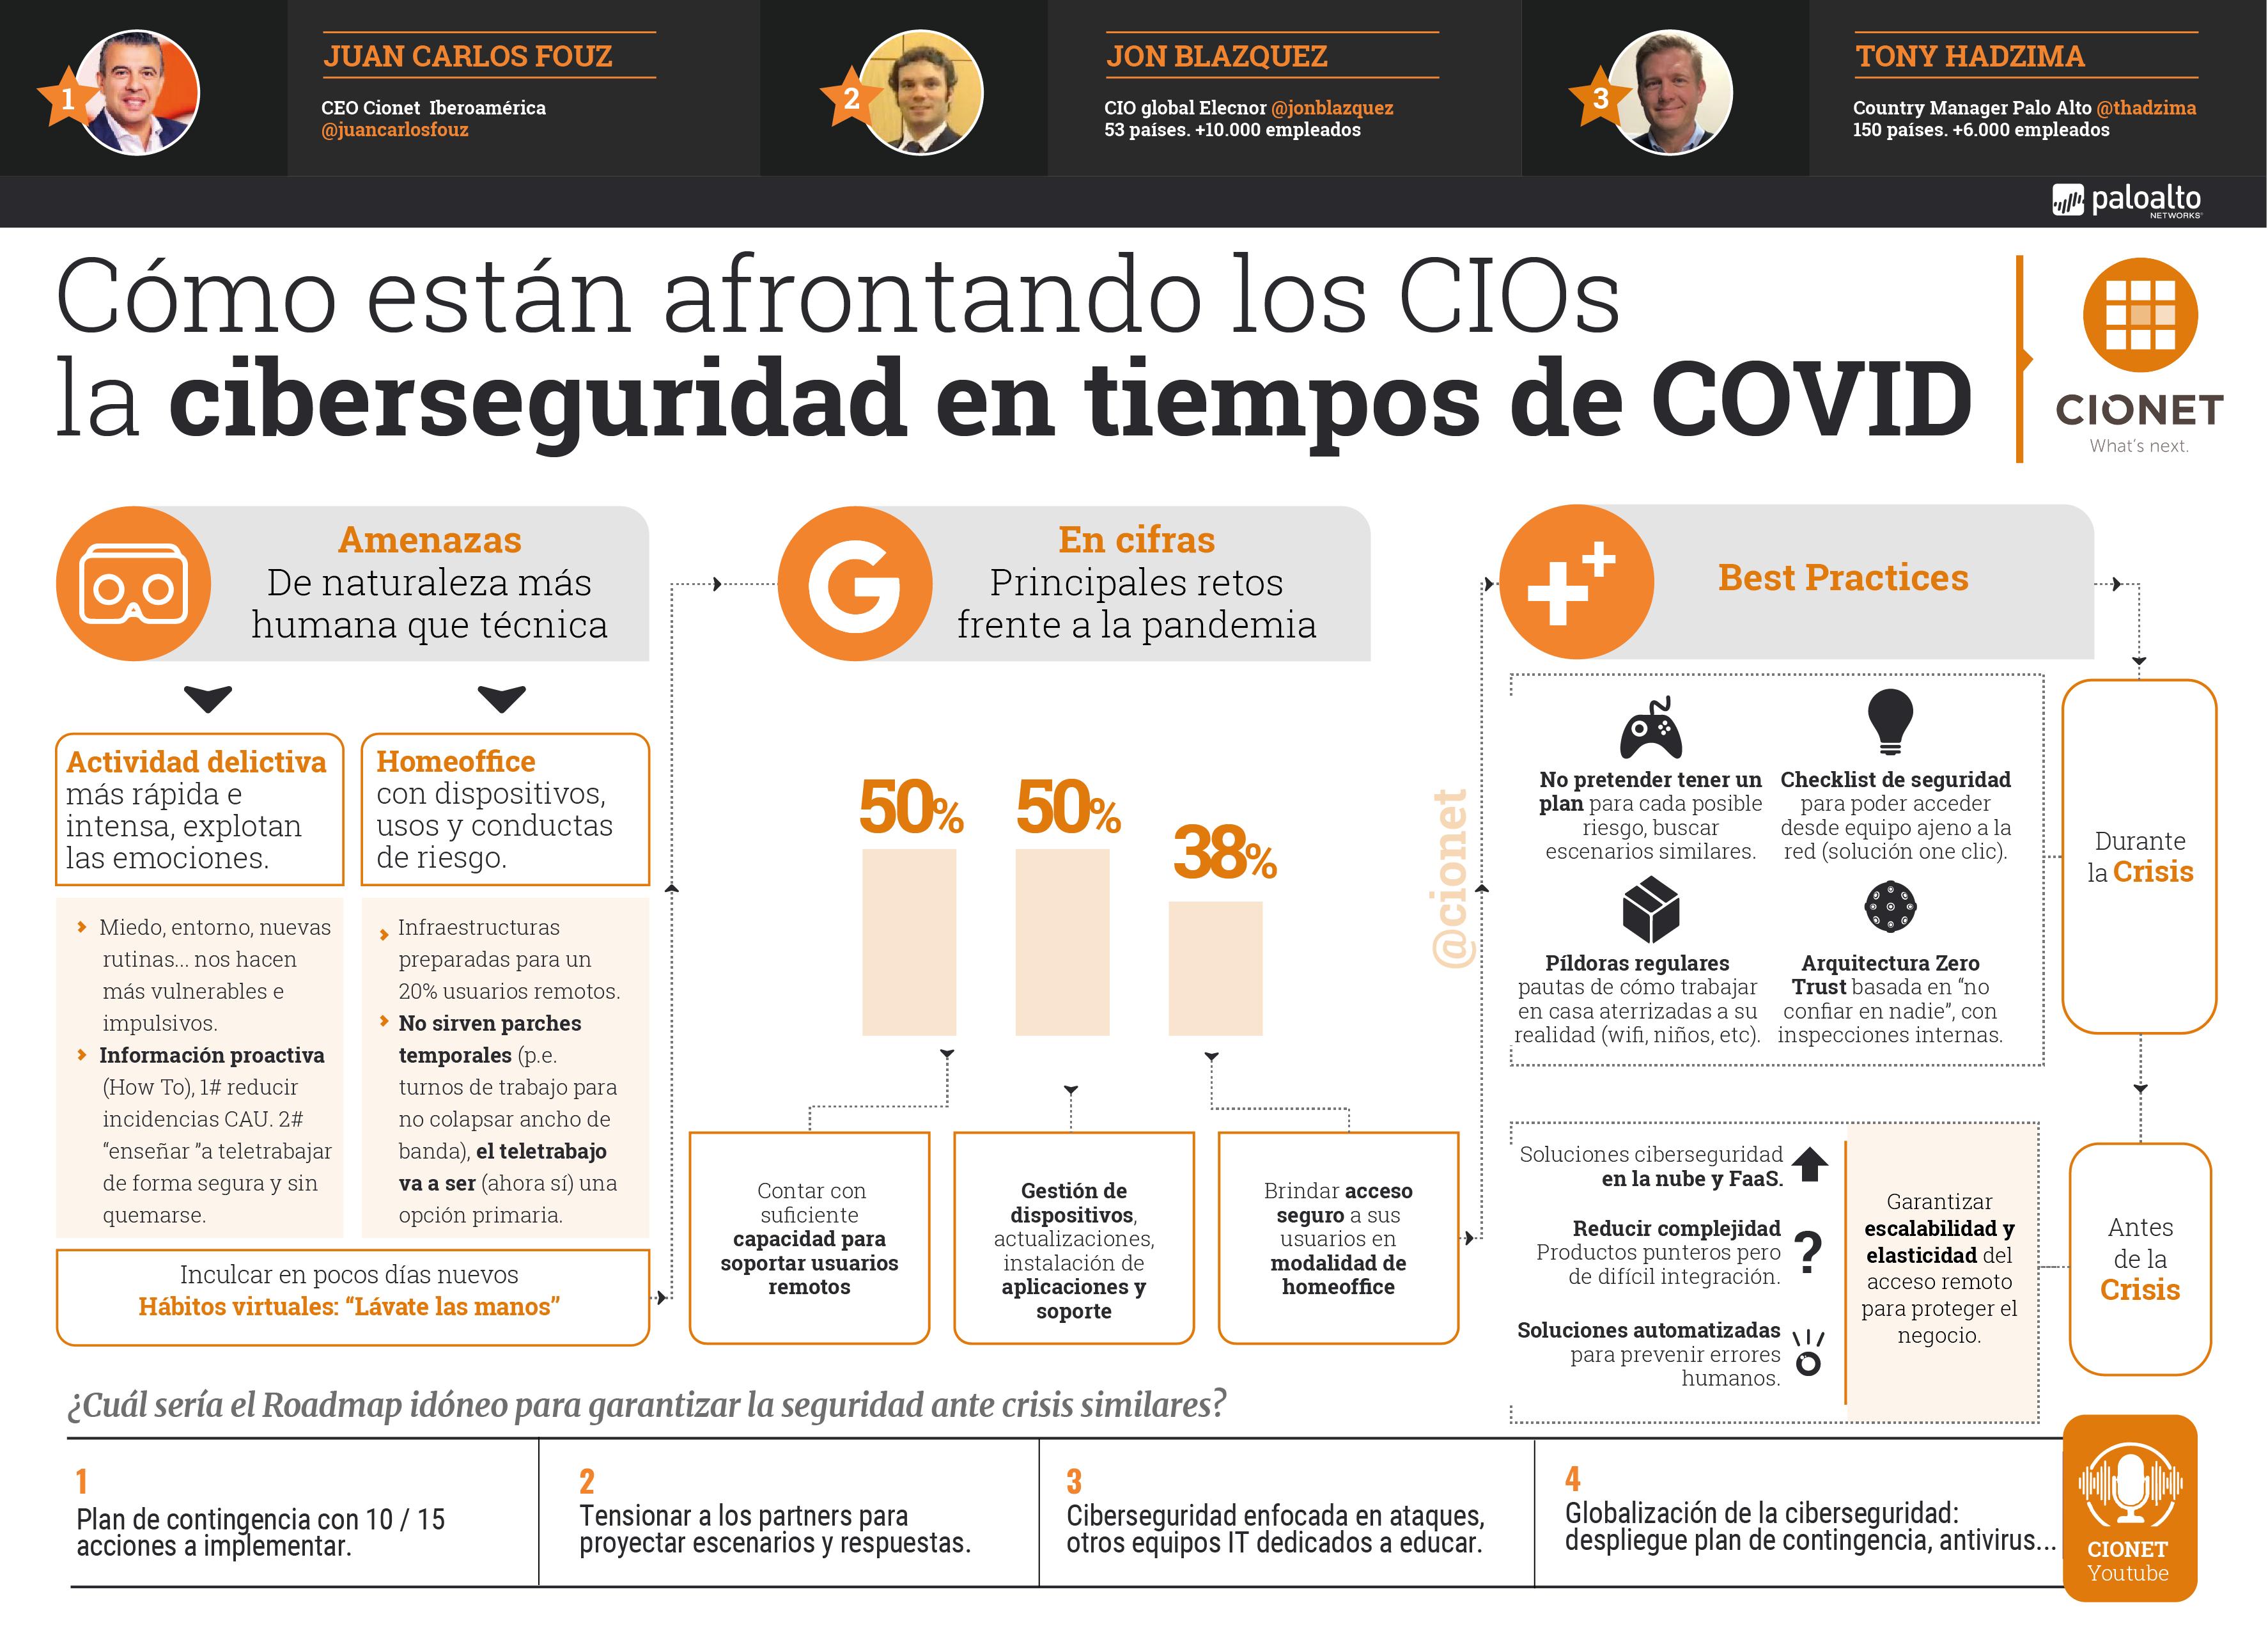 INFO ciberseguridadad CIONET_v3-01